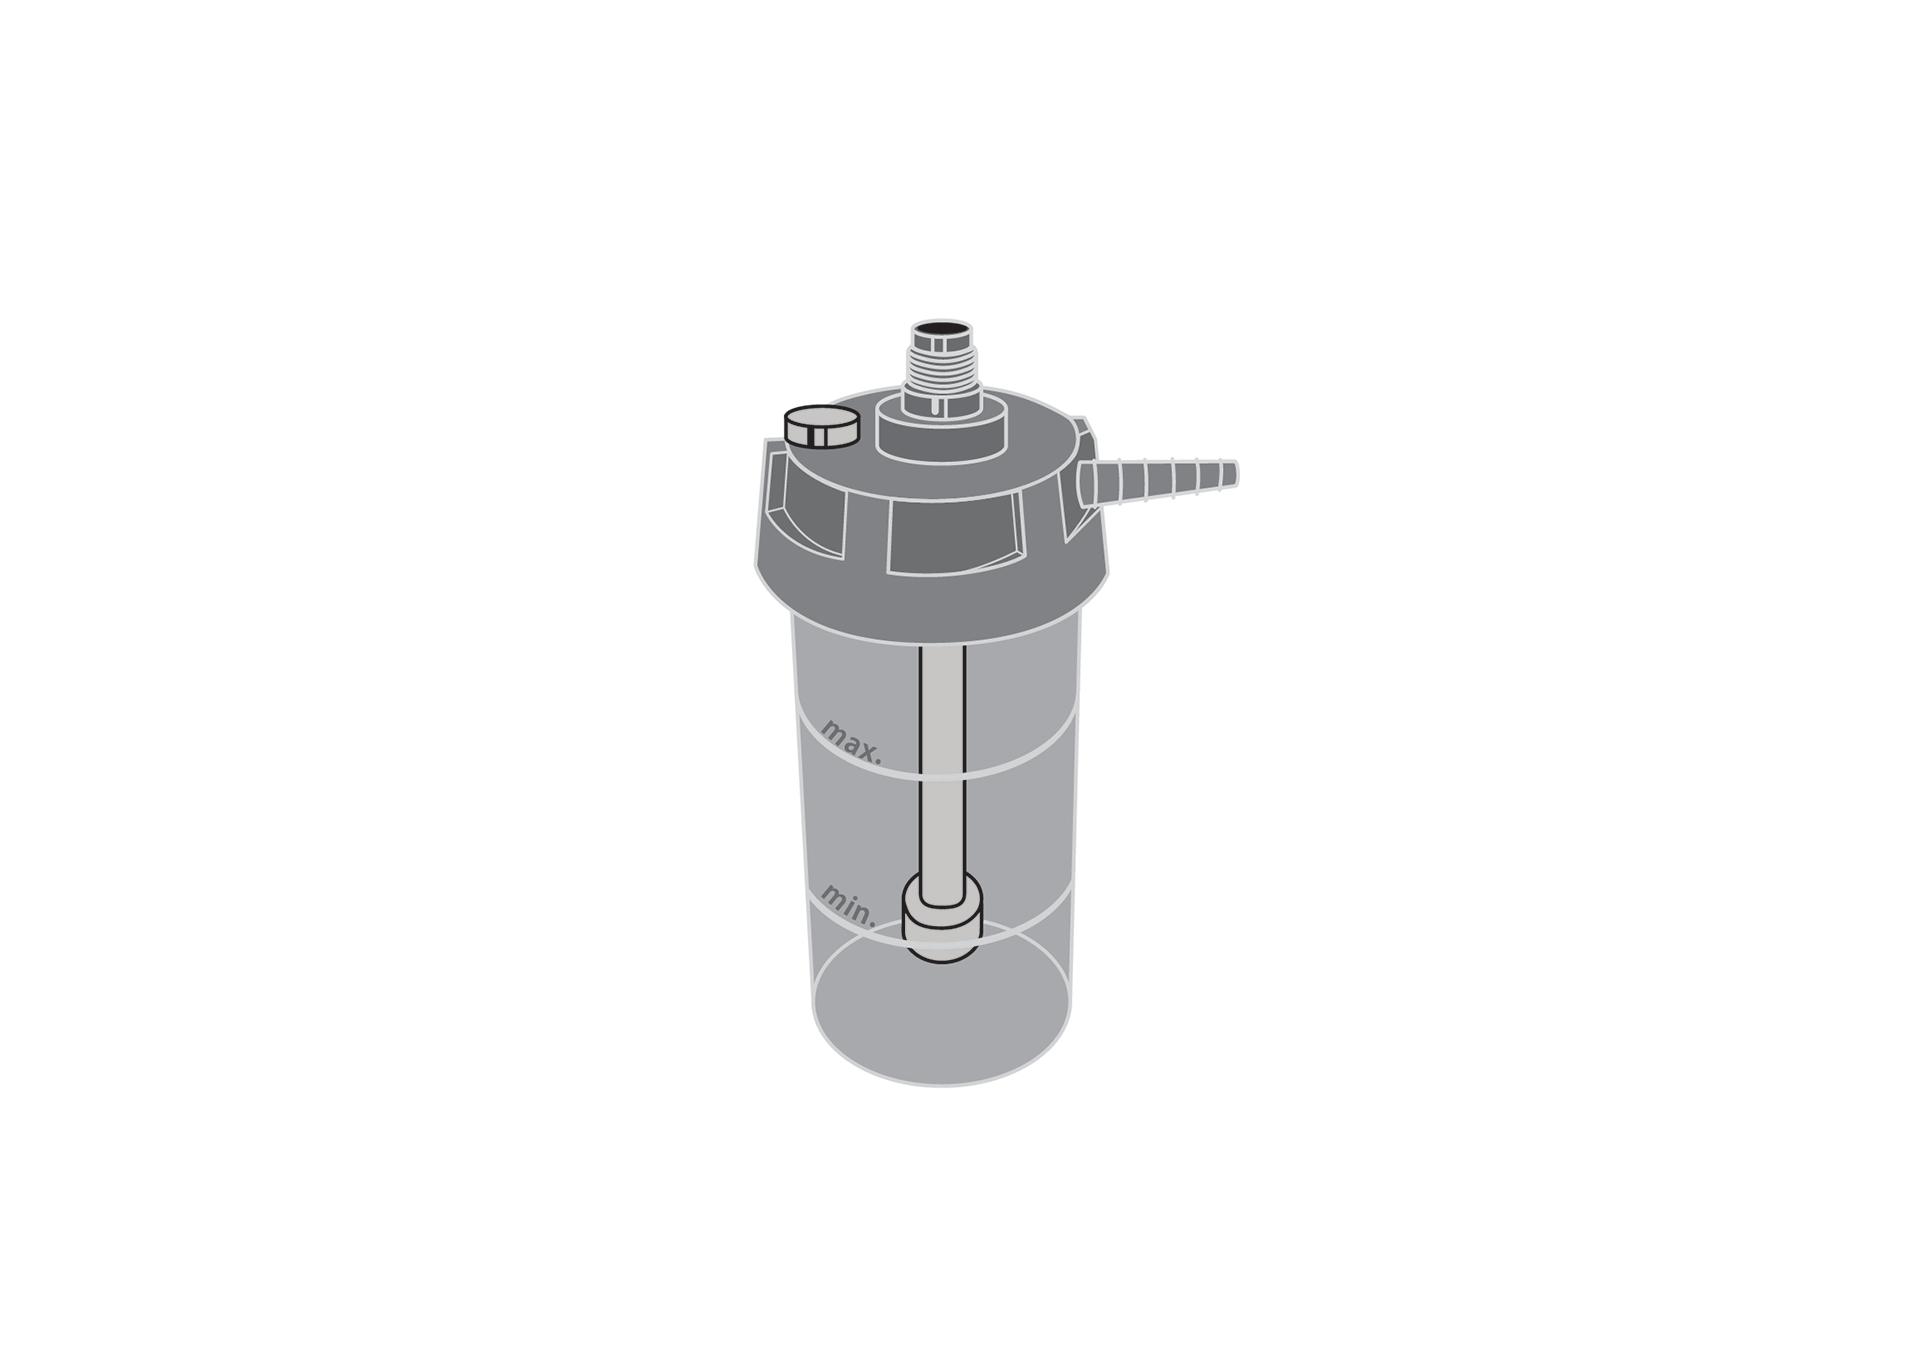 Humidifier bottle, nonheated, reusable